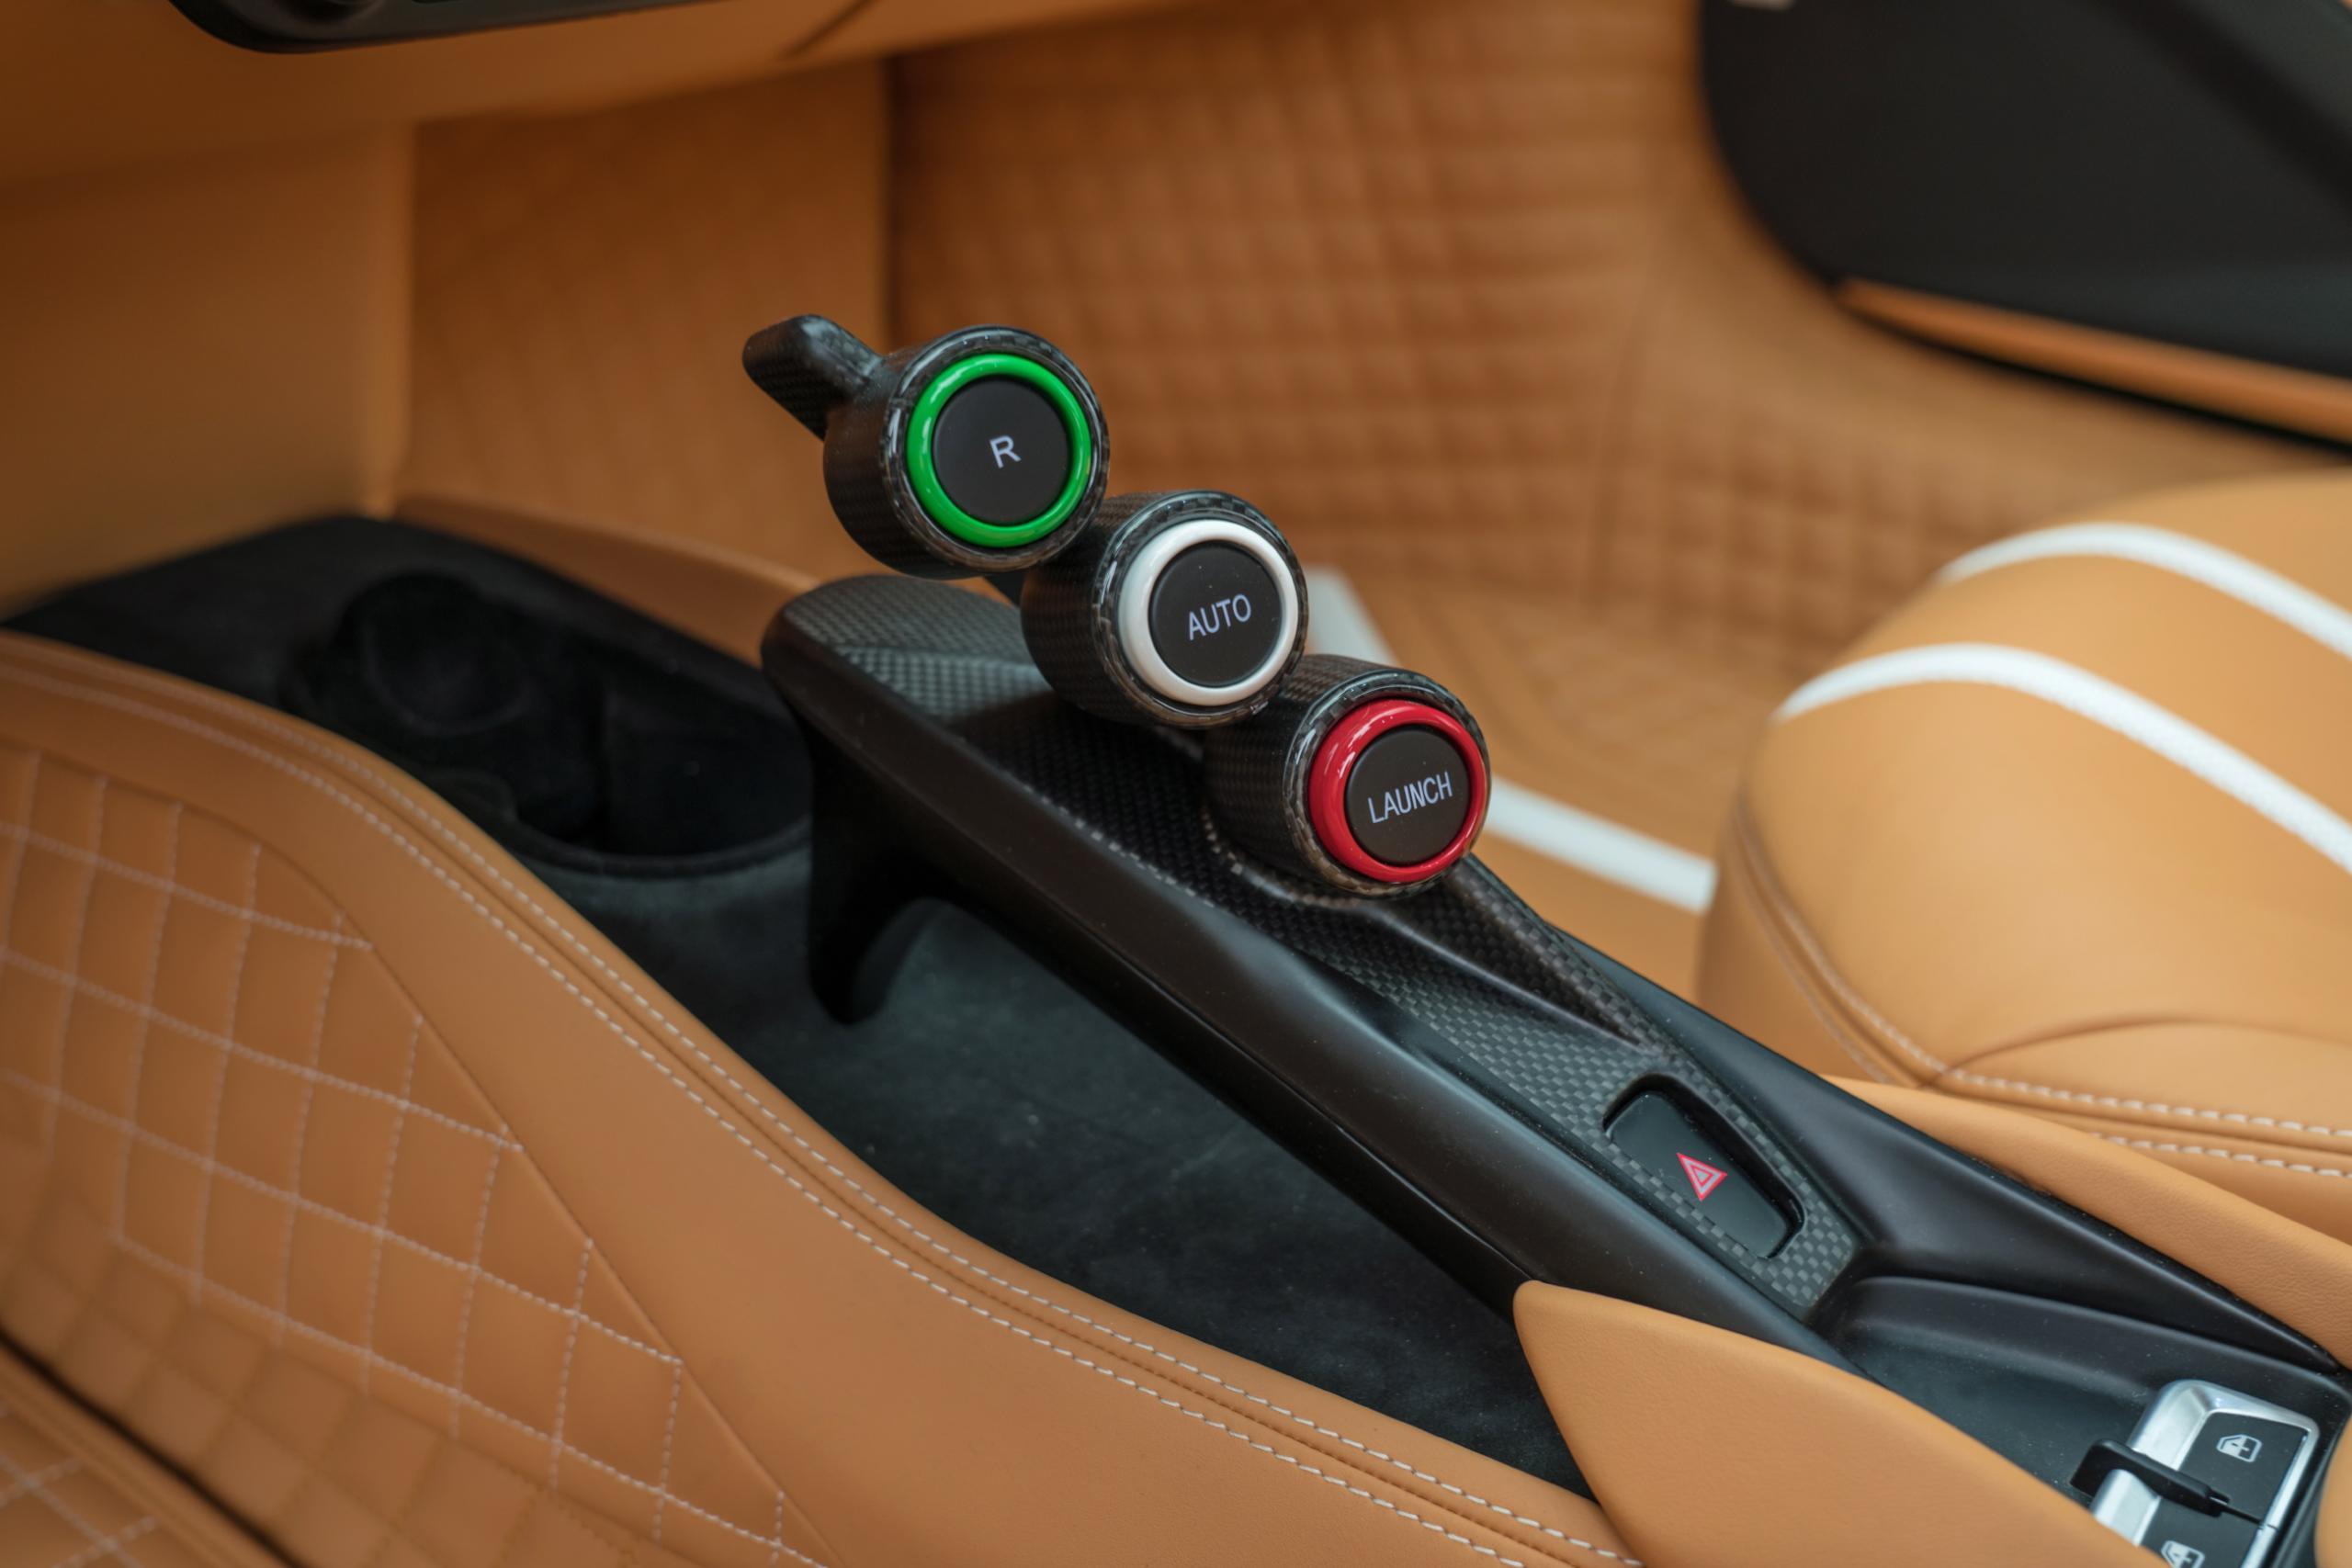 mansory f8xx ferrari f8 body kit carbon fiber interior panel 2020 2021